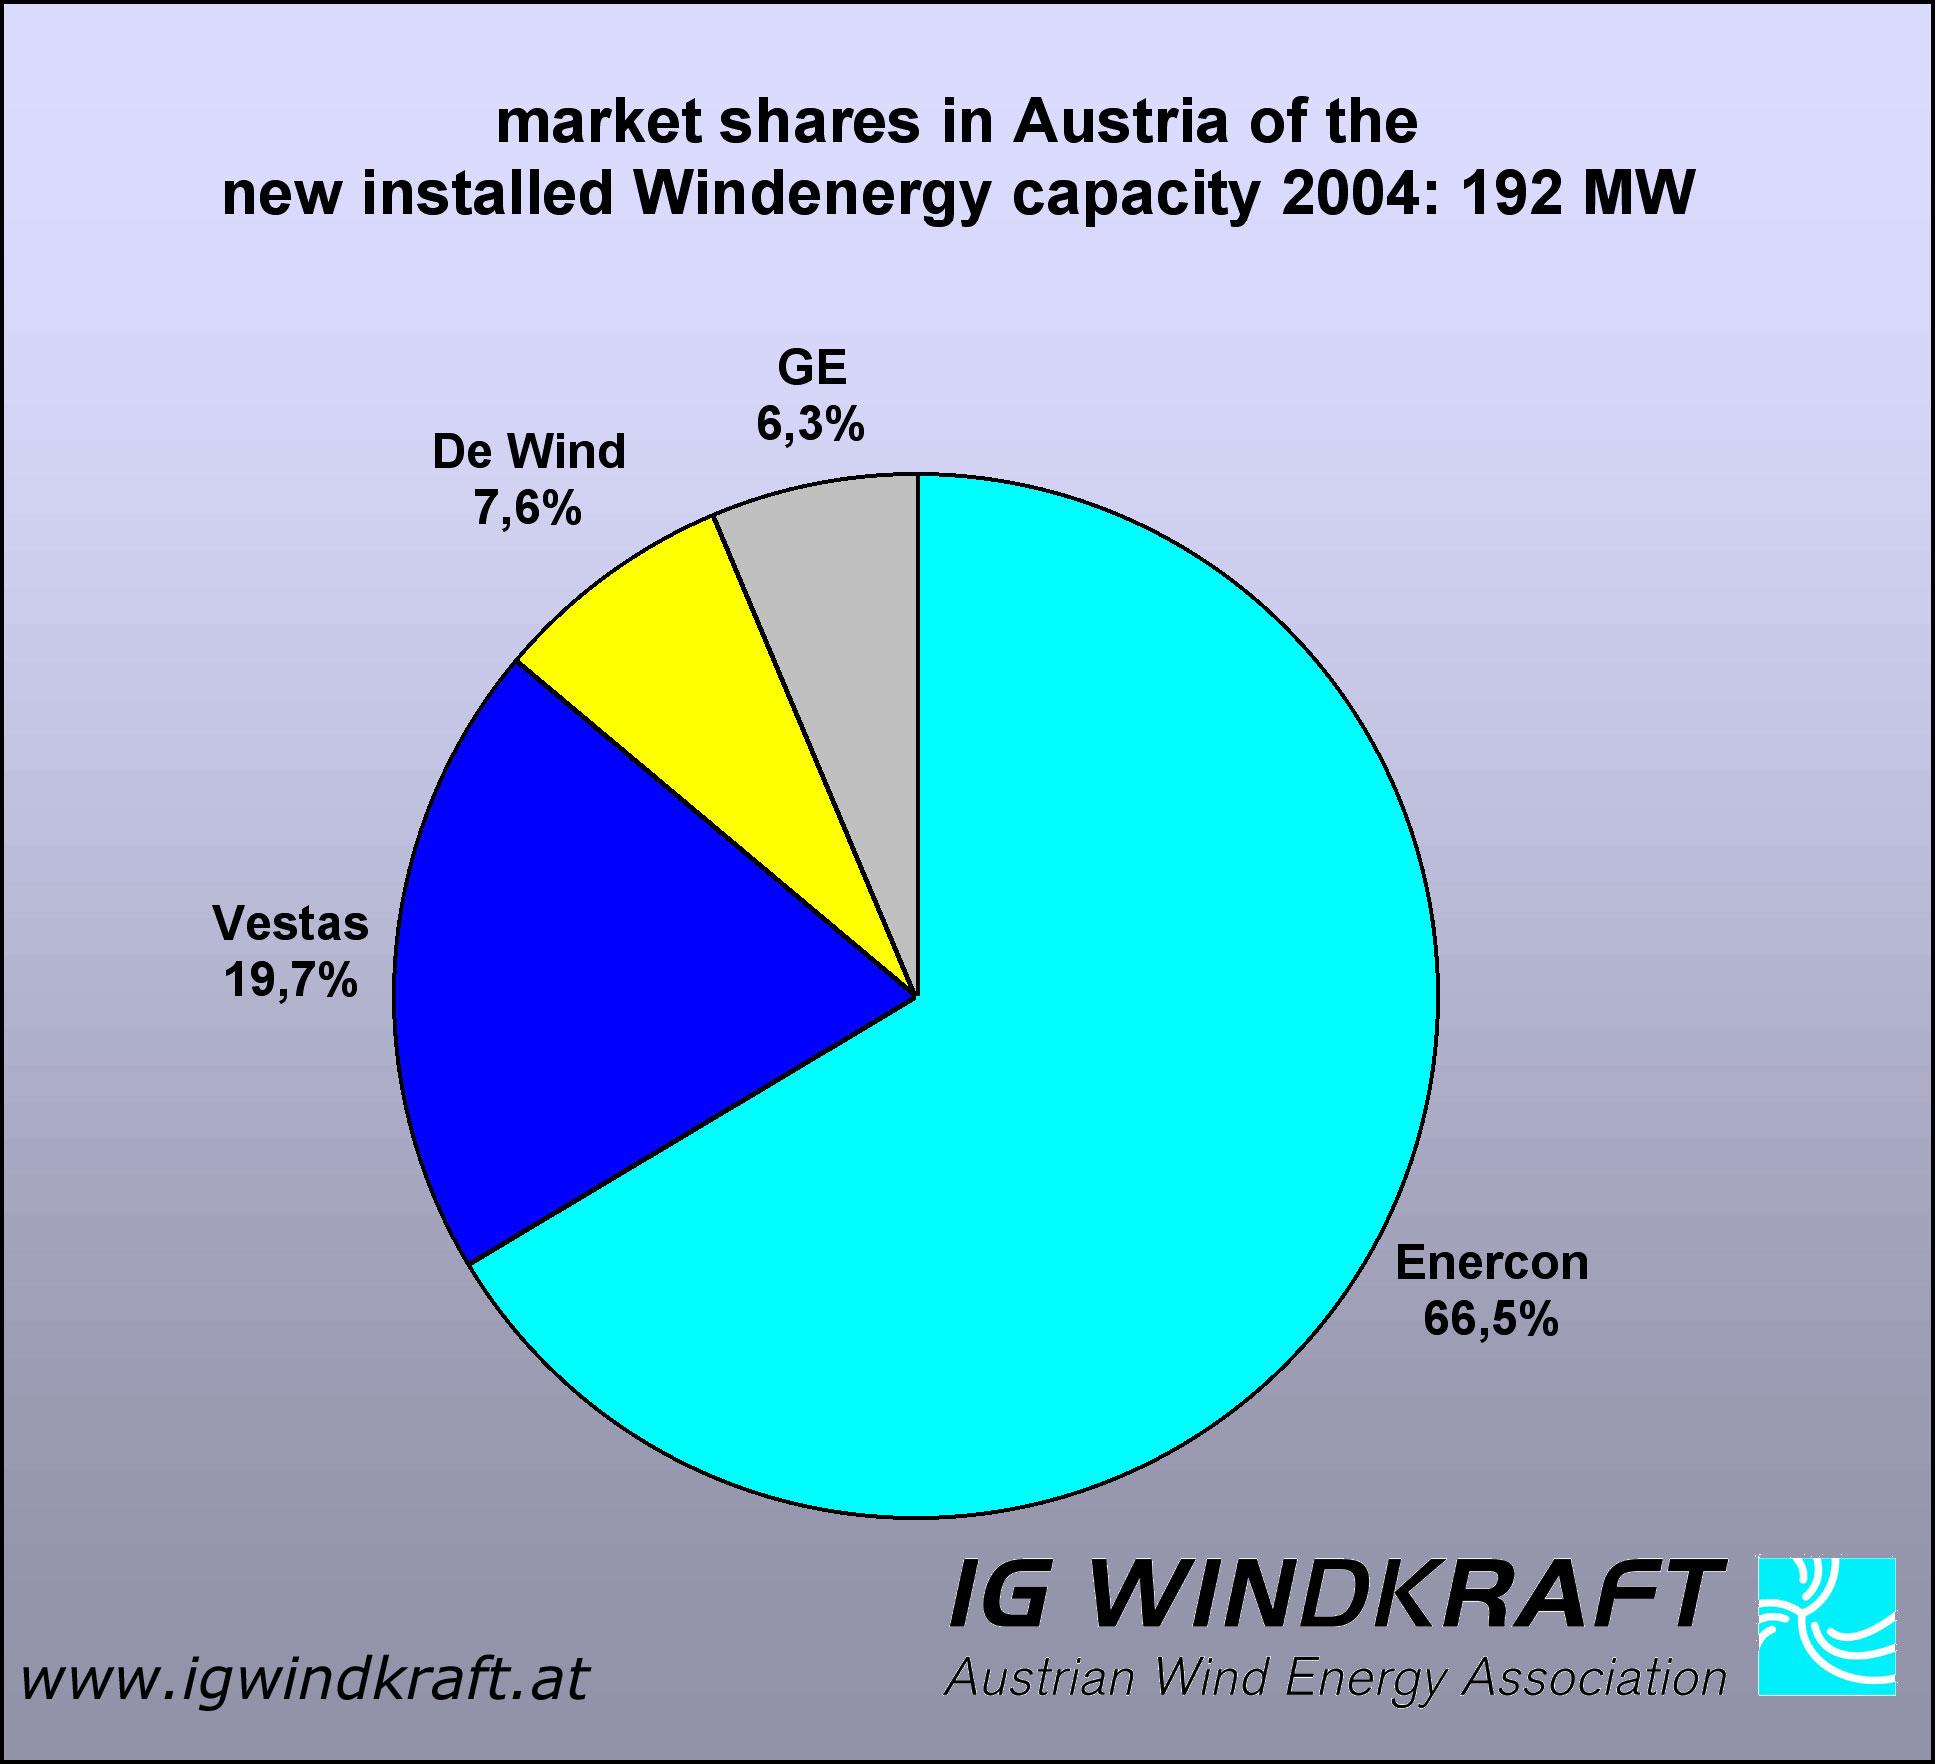 IG Windkraft Wind Energy in Austria Windenergie